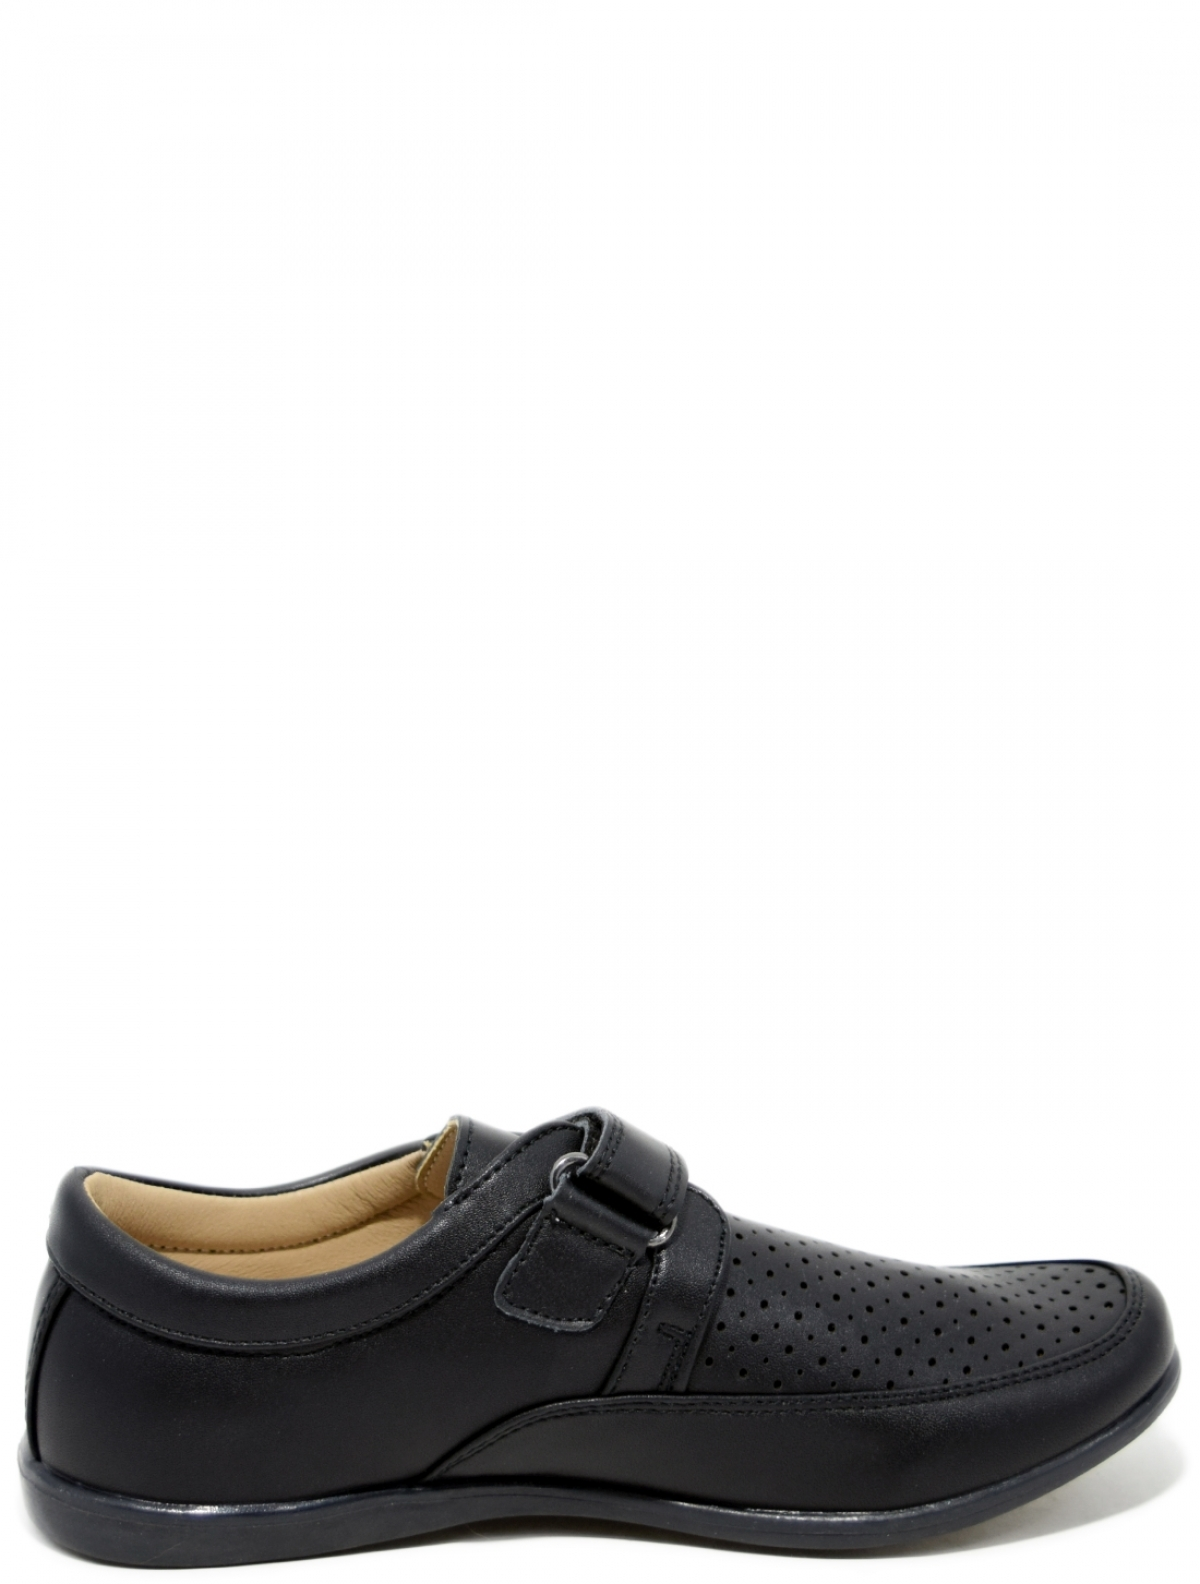 Tom Miki B-1324 туфли для мальчика